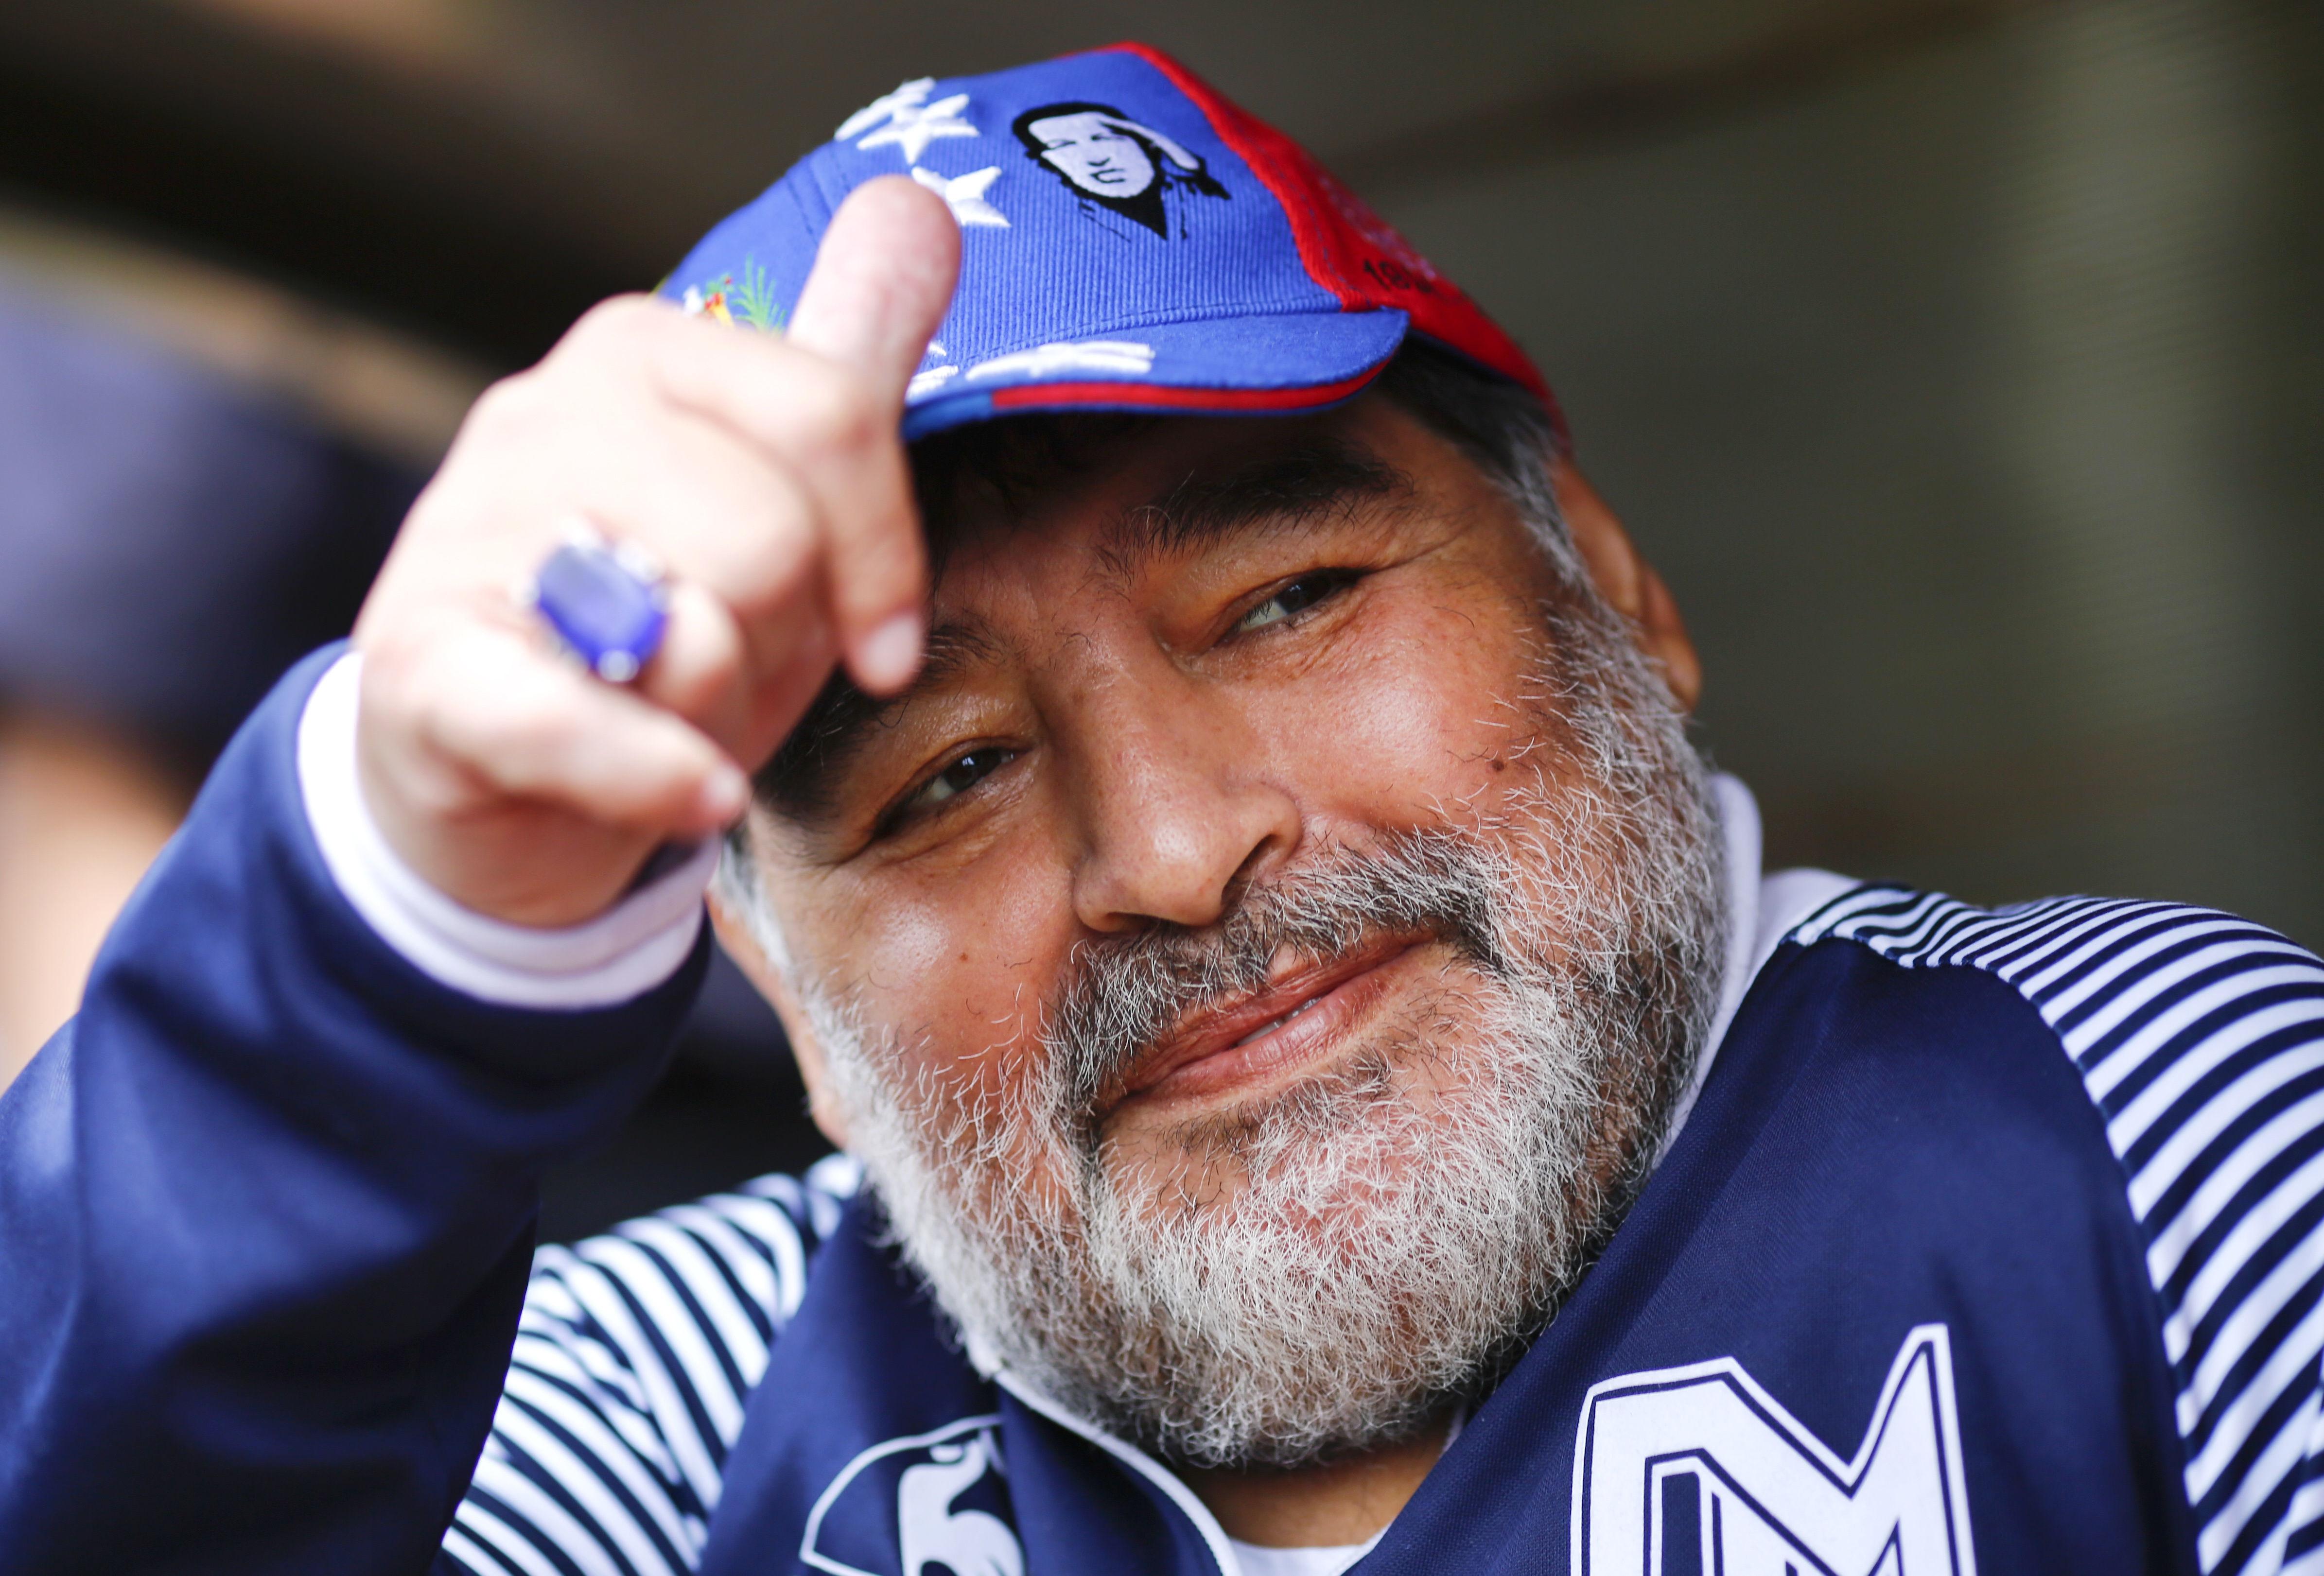 Символ футбола. ФОТО галерея памяти Диего Марадоны - фото 43